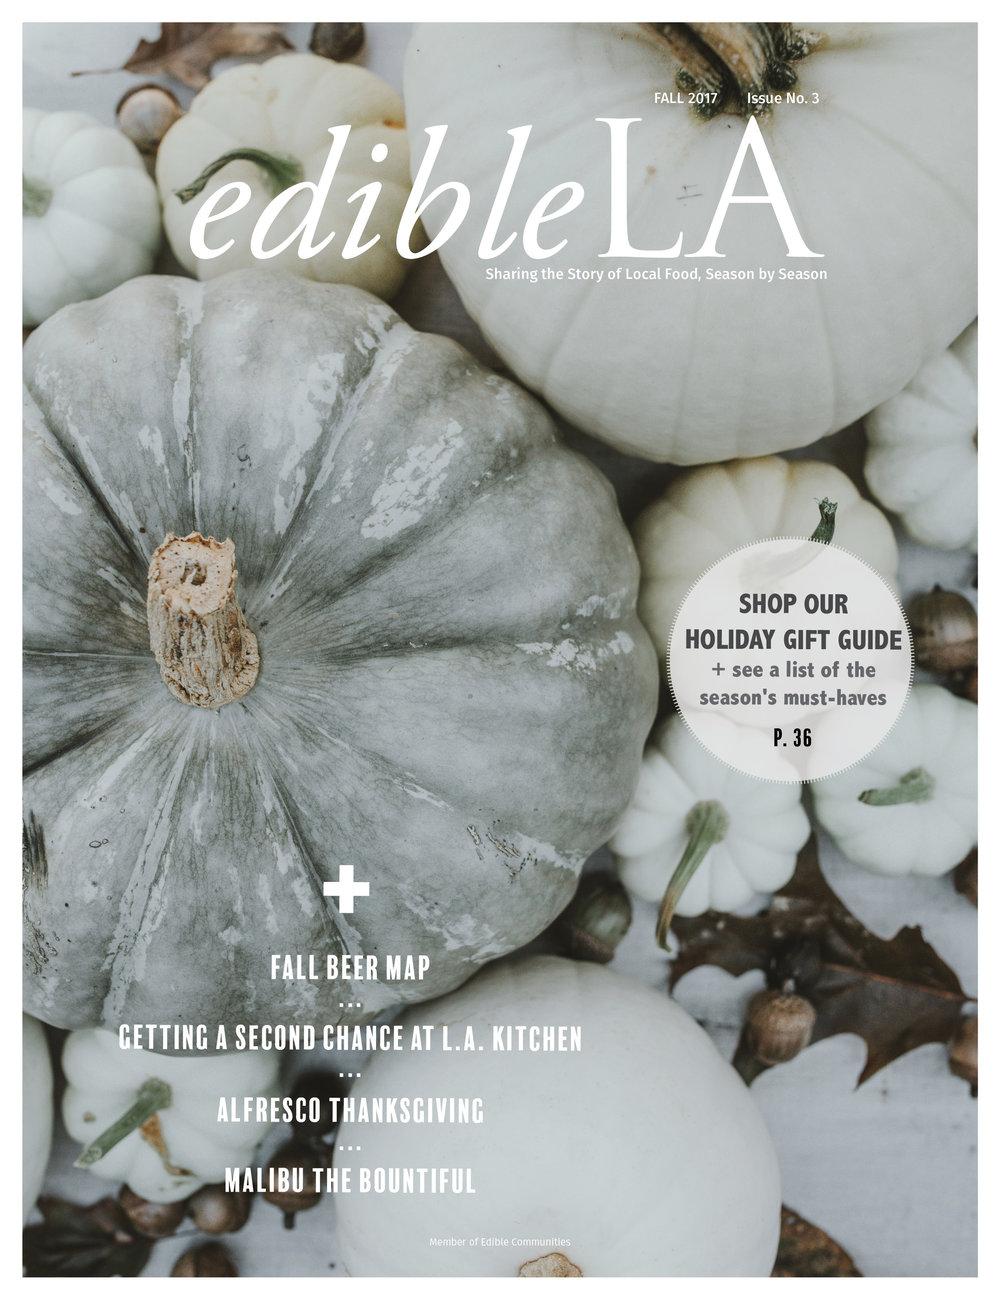 Edible_LA_Fall_2017_Cover.jpg